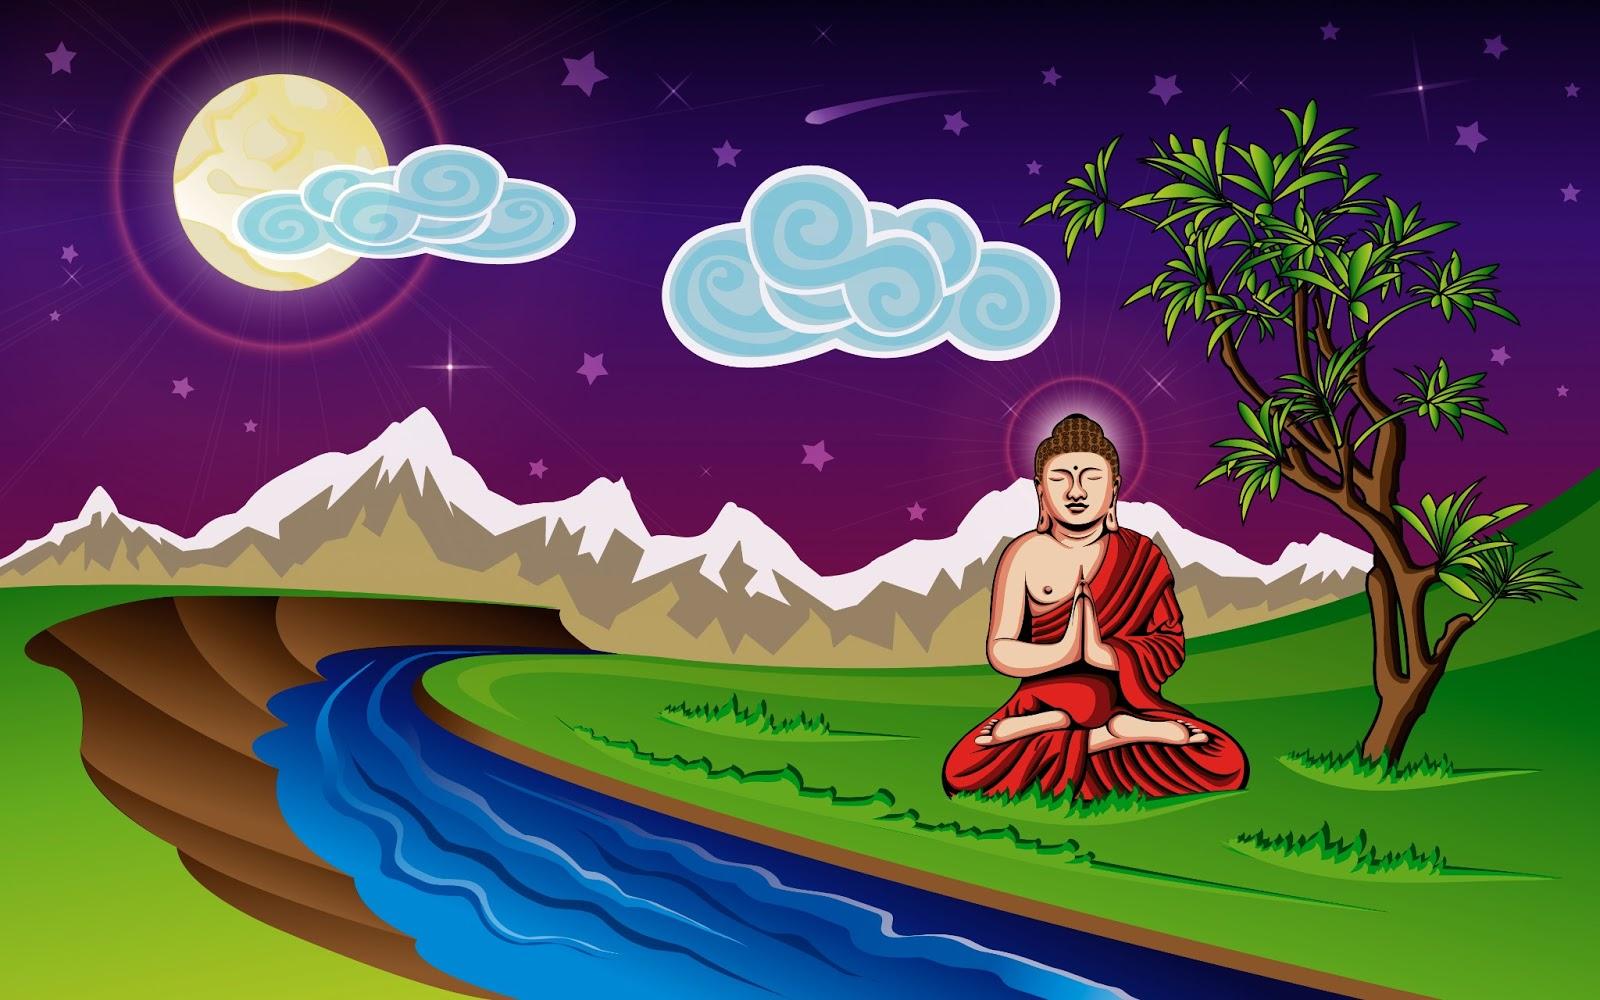 HD Wallpaper: Lord Buddha HD Wallpapers